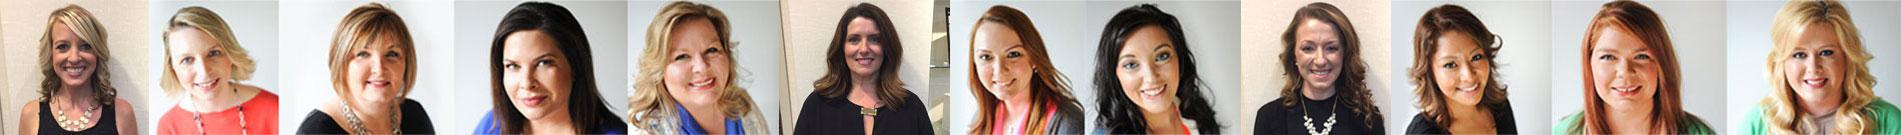 Knoxville Dermatologist Staff Photo